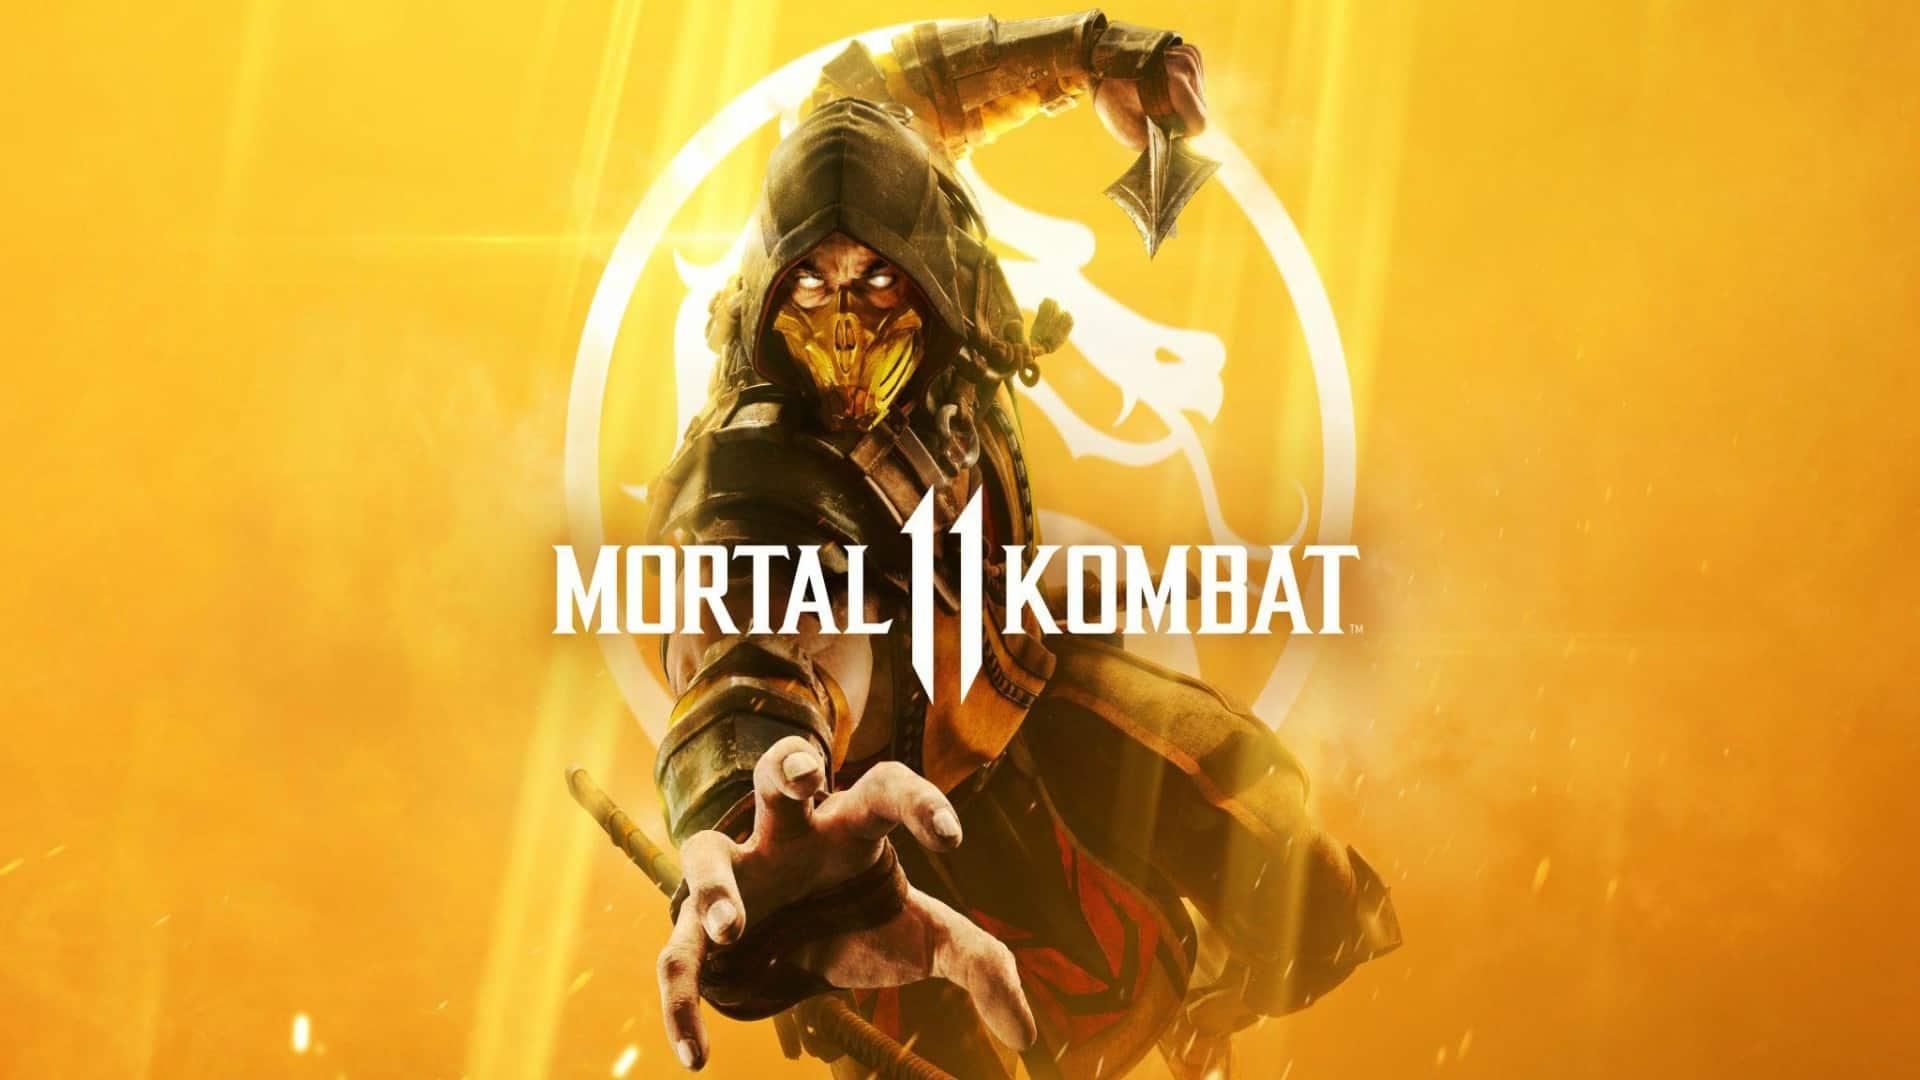 TRAILERS: Warner Bros Reveals First Look At Mortal Kombat 11